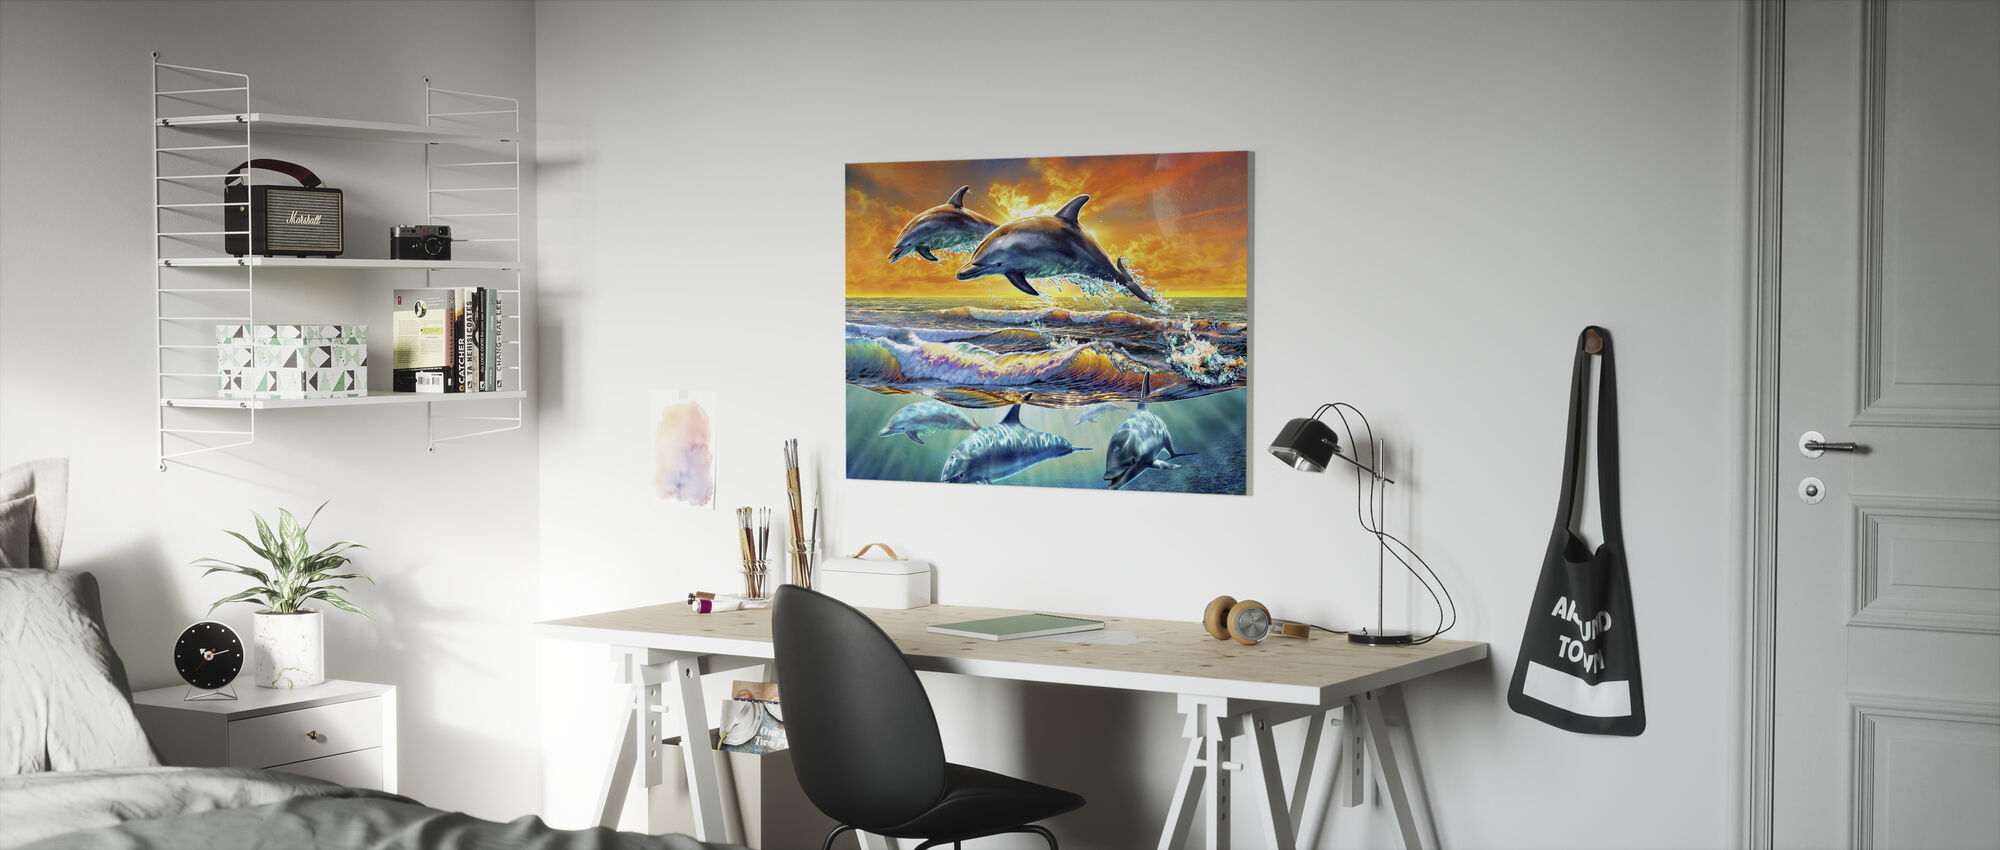 Dolfijnen bij zonsopgang - Canvas print - Kinderkamer